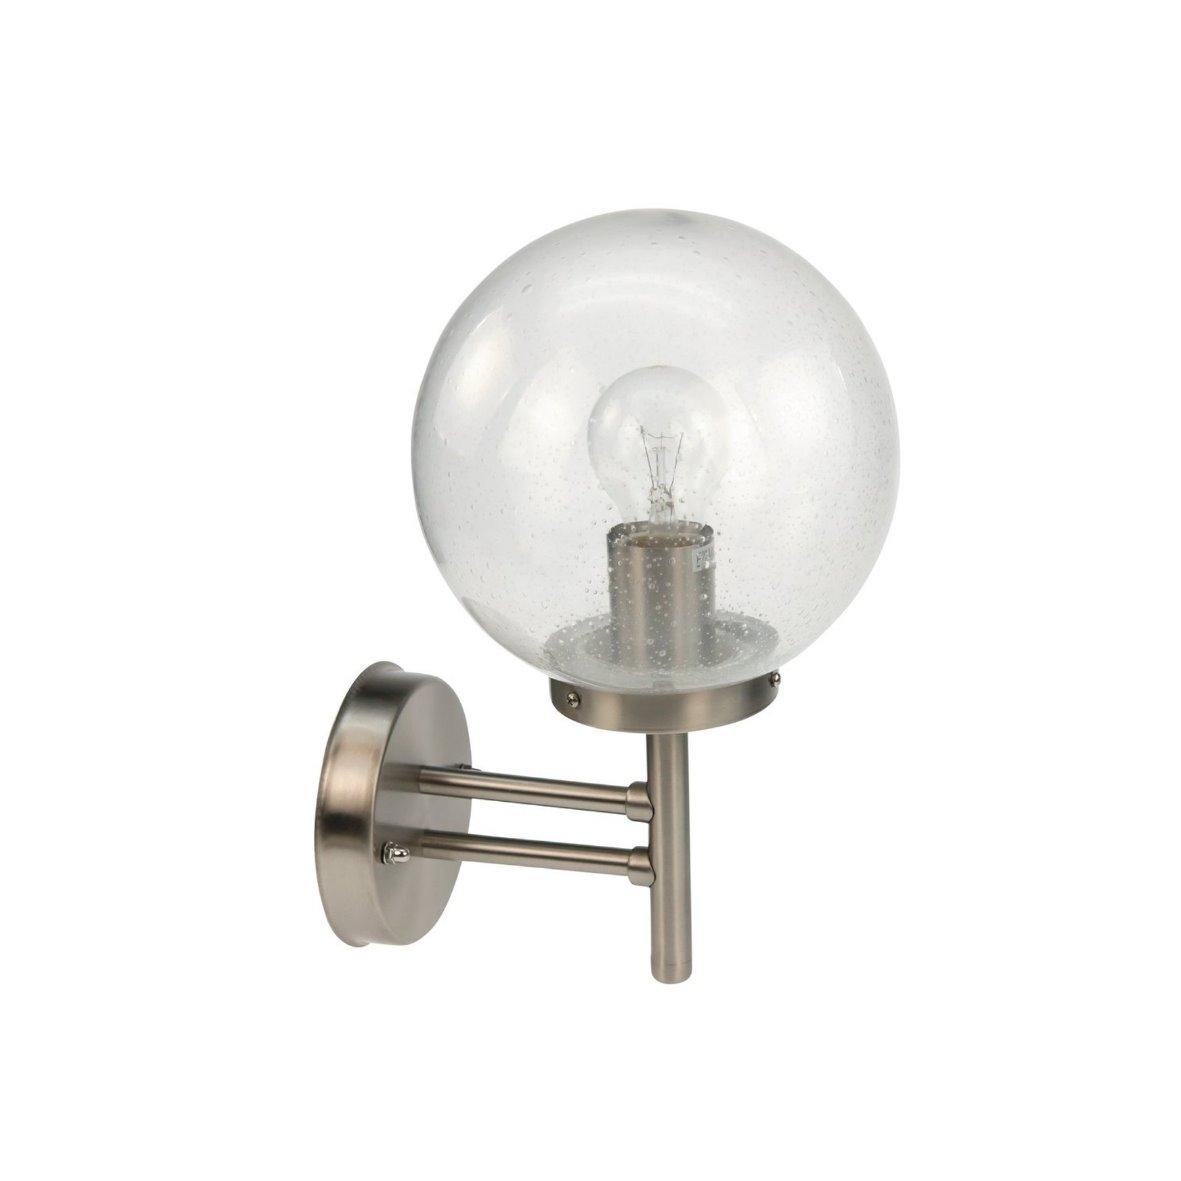 aussenleuchte aussenlampe aussen wand lampe leuchte. Black Bedroom Furniture Sets. Home Design Ideas